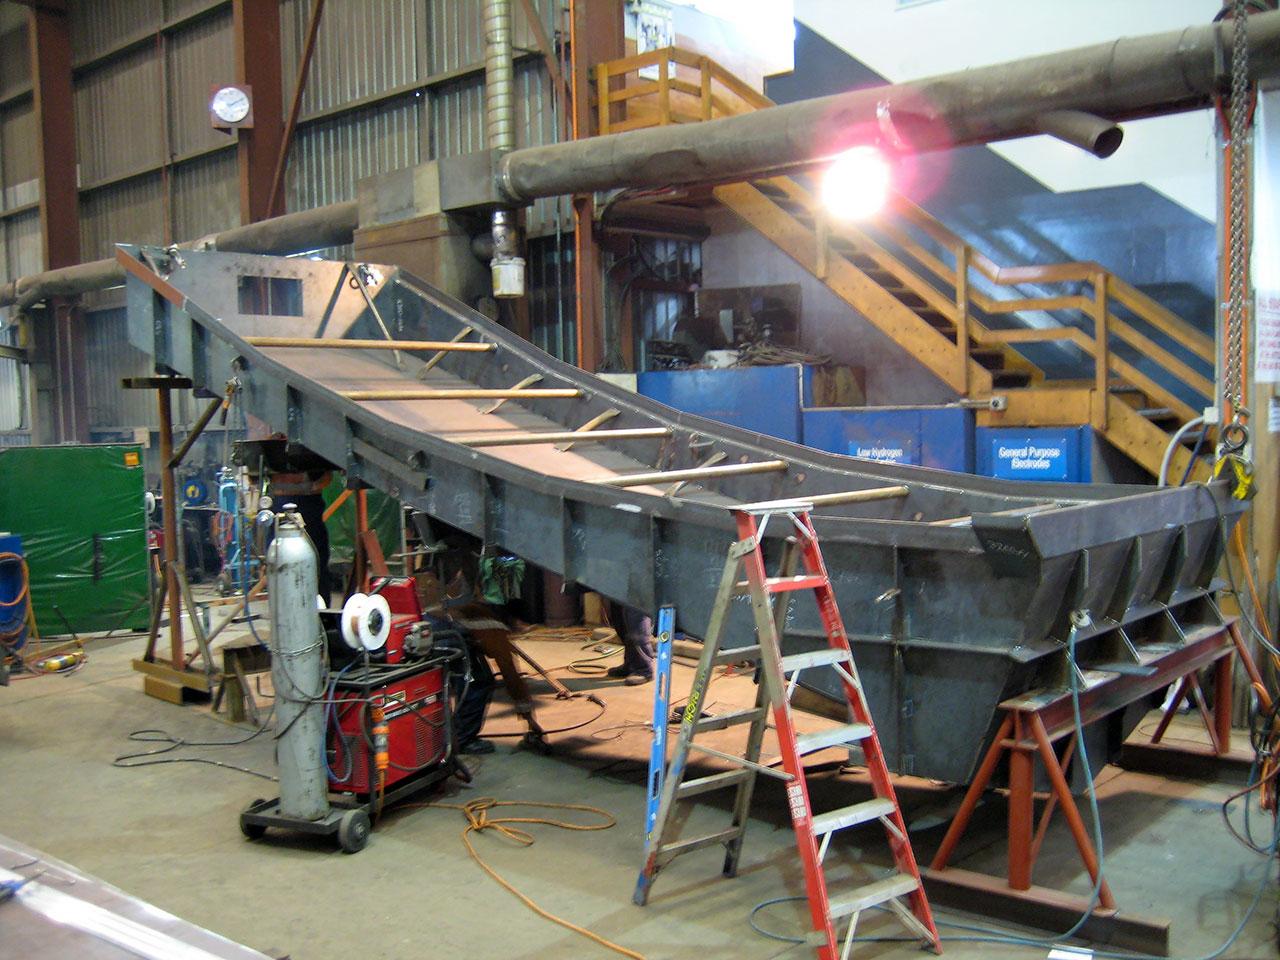 Slurry hopper for the Stockton Coal Plant